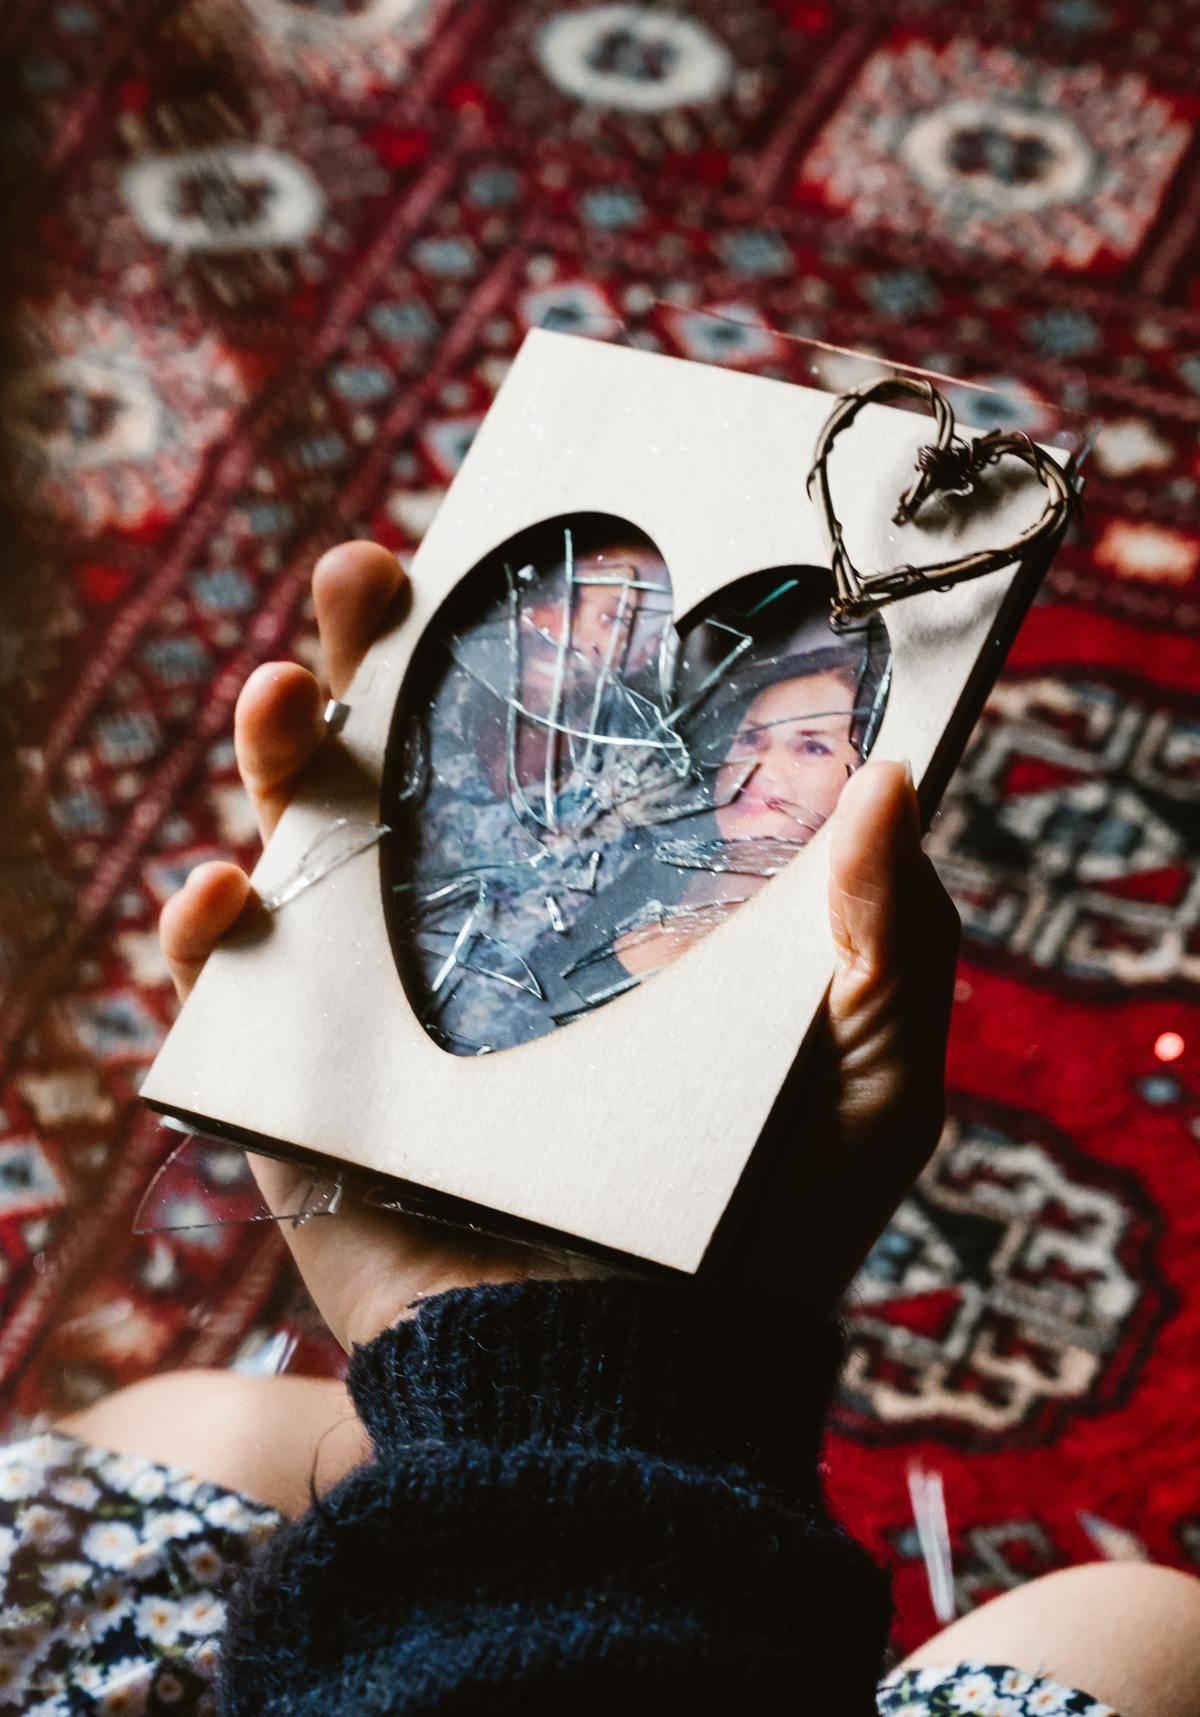 Broken frame photo in heart shape, smashed glass